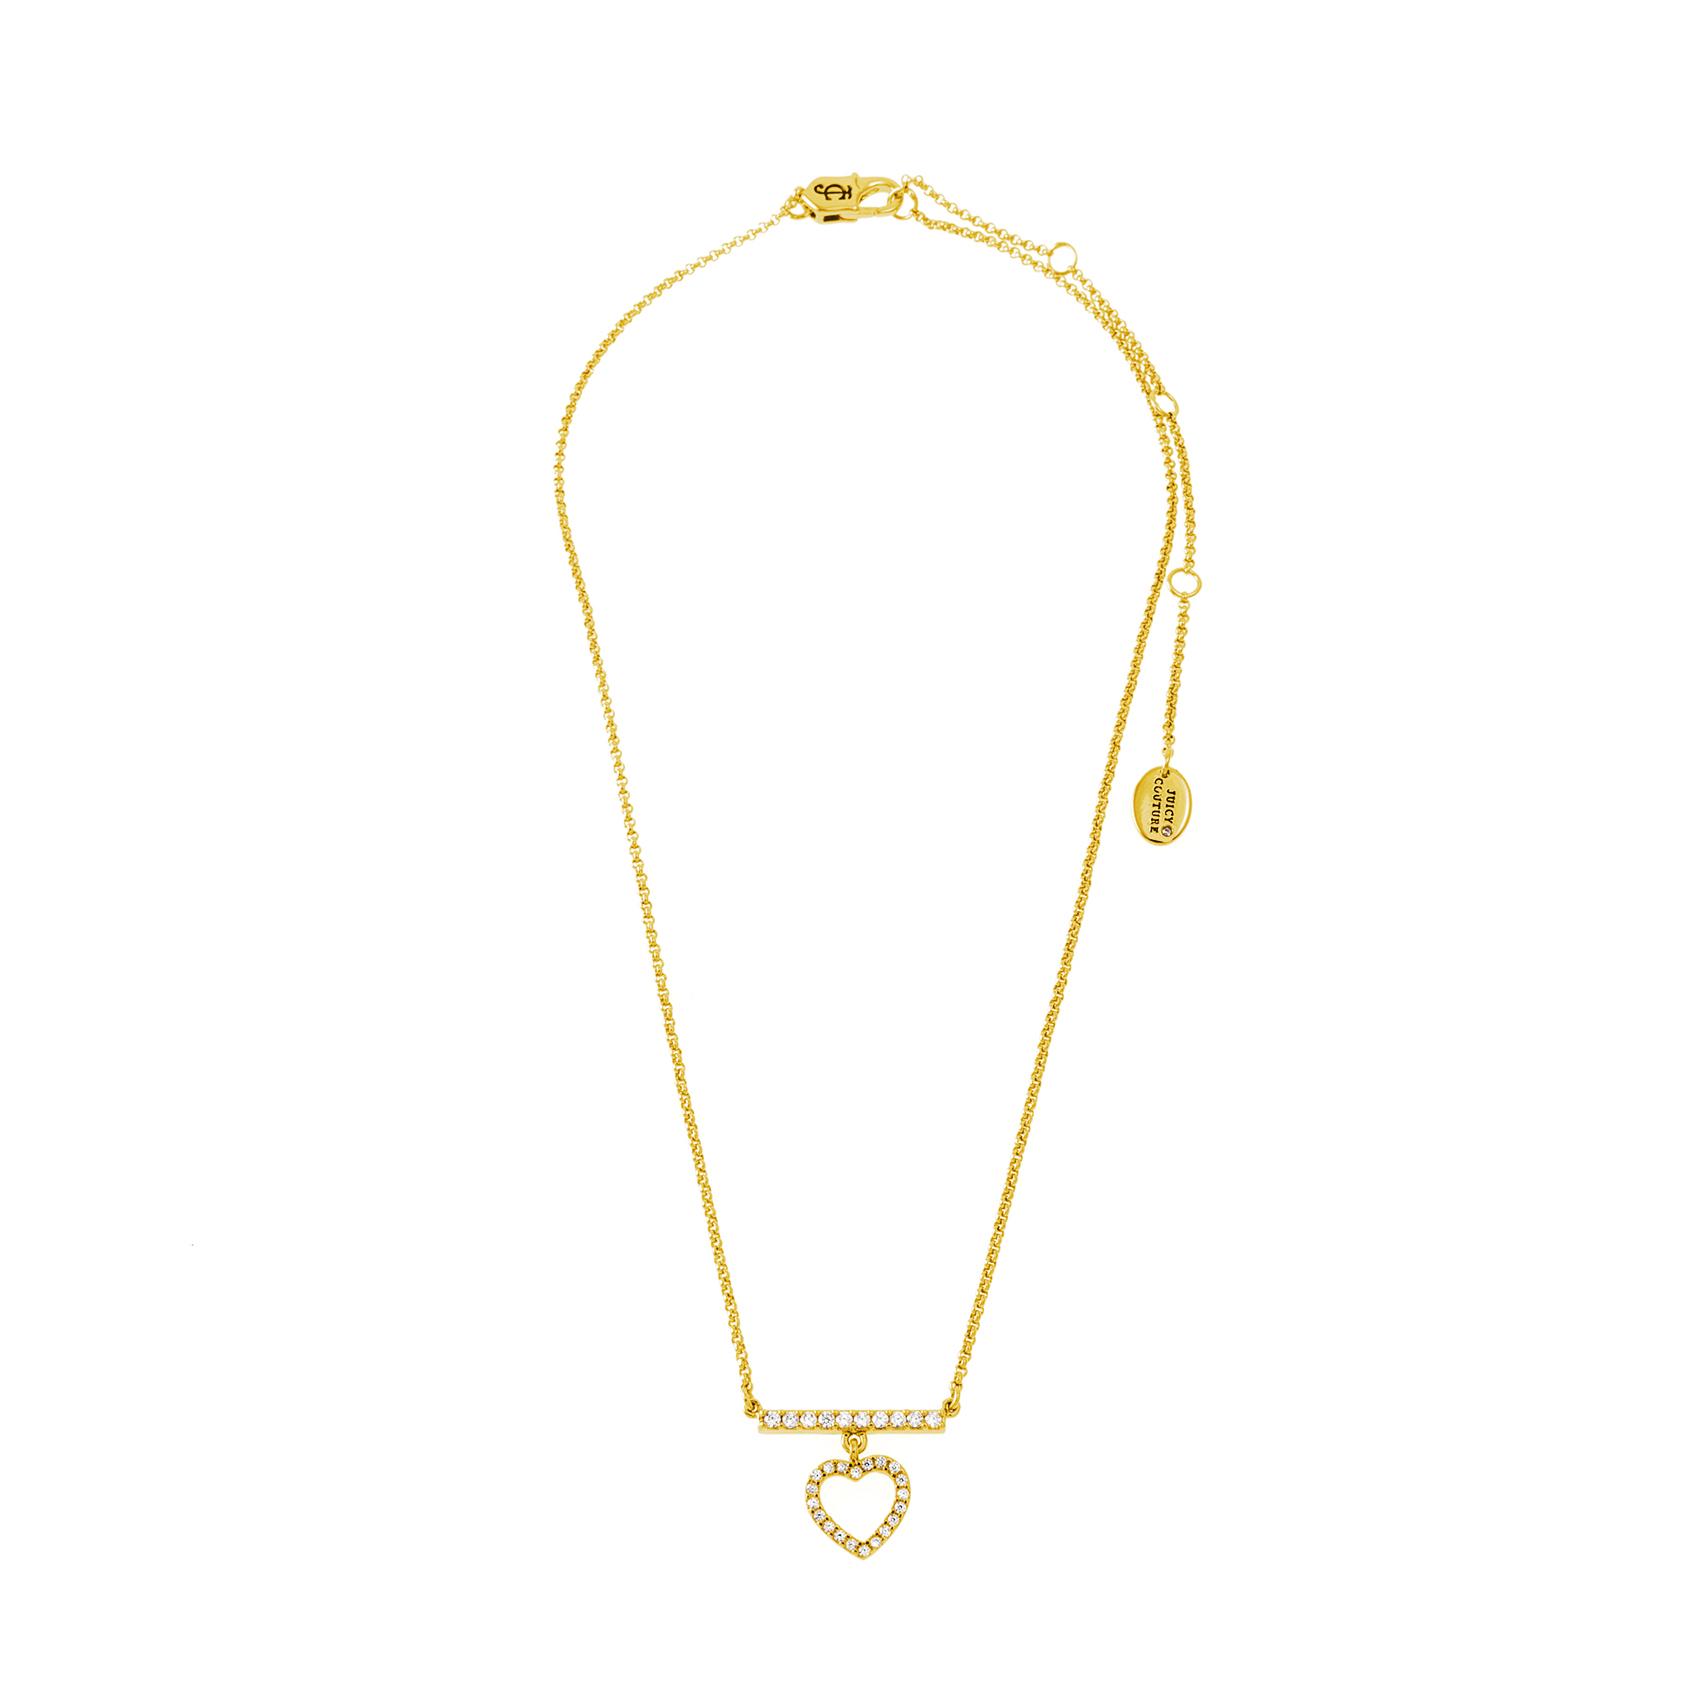 JUICY COUTURE - Κολιέ JUICY COUTURE γυναικεία αξεσουάρ κοσμήματα κολιέ